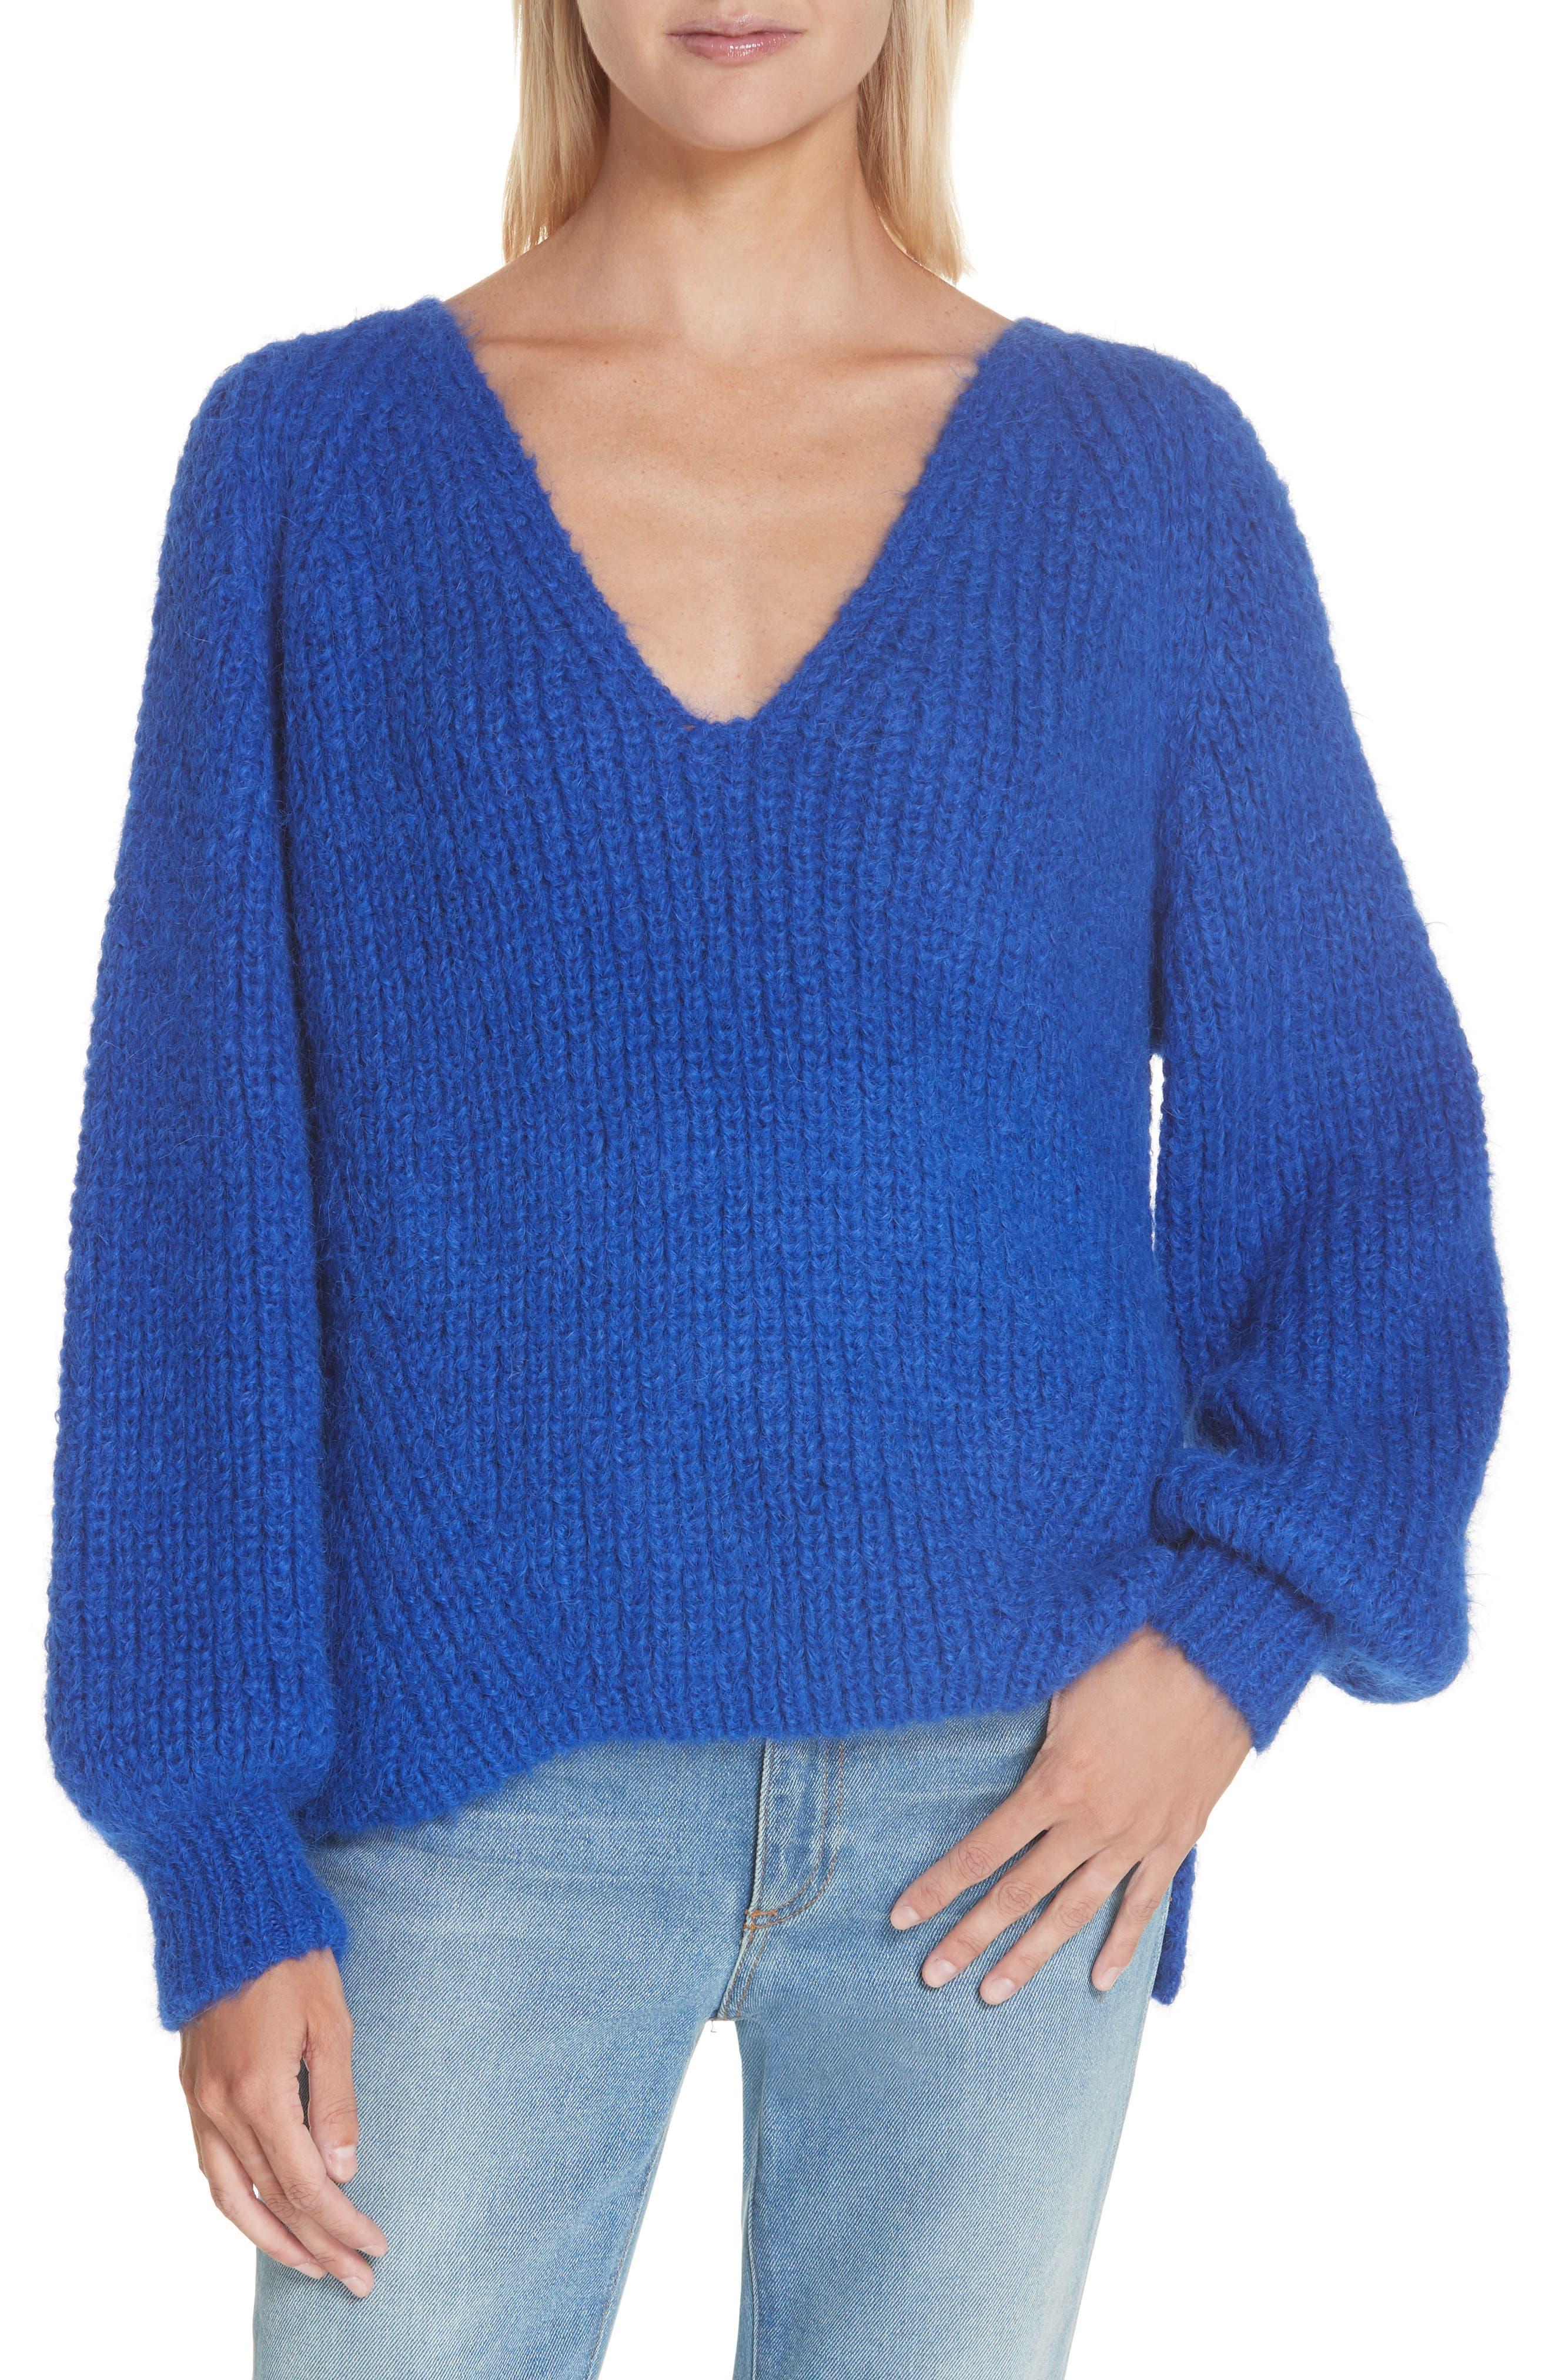 ELEVEN SIX Tess Alpaca & Wool Blend Sweater, Main, color, COLBOLT BLUE